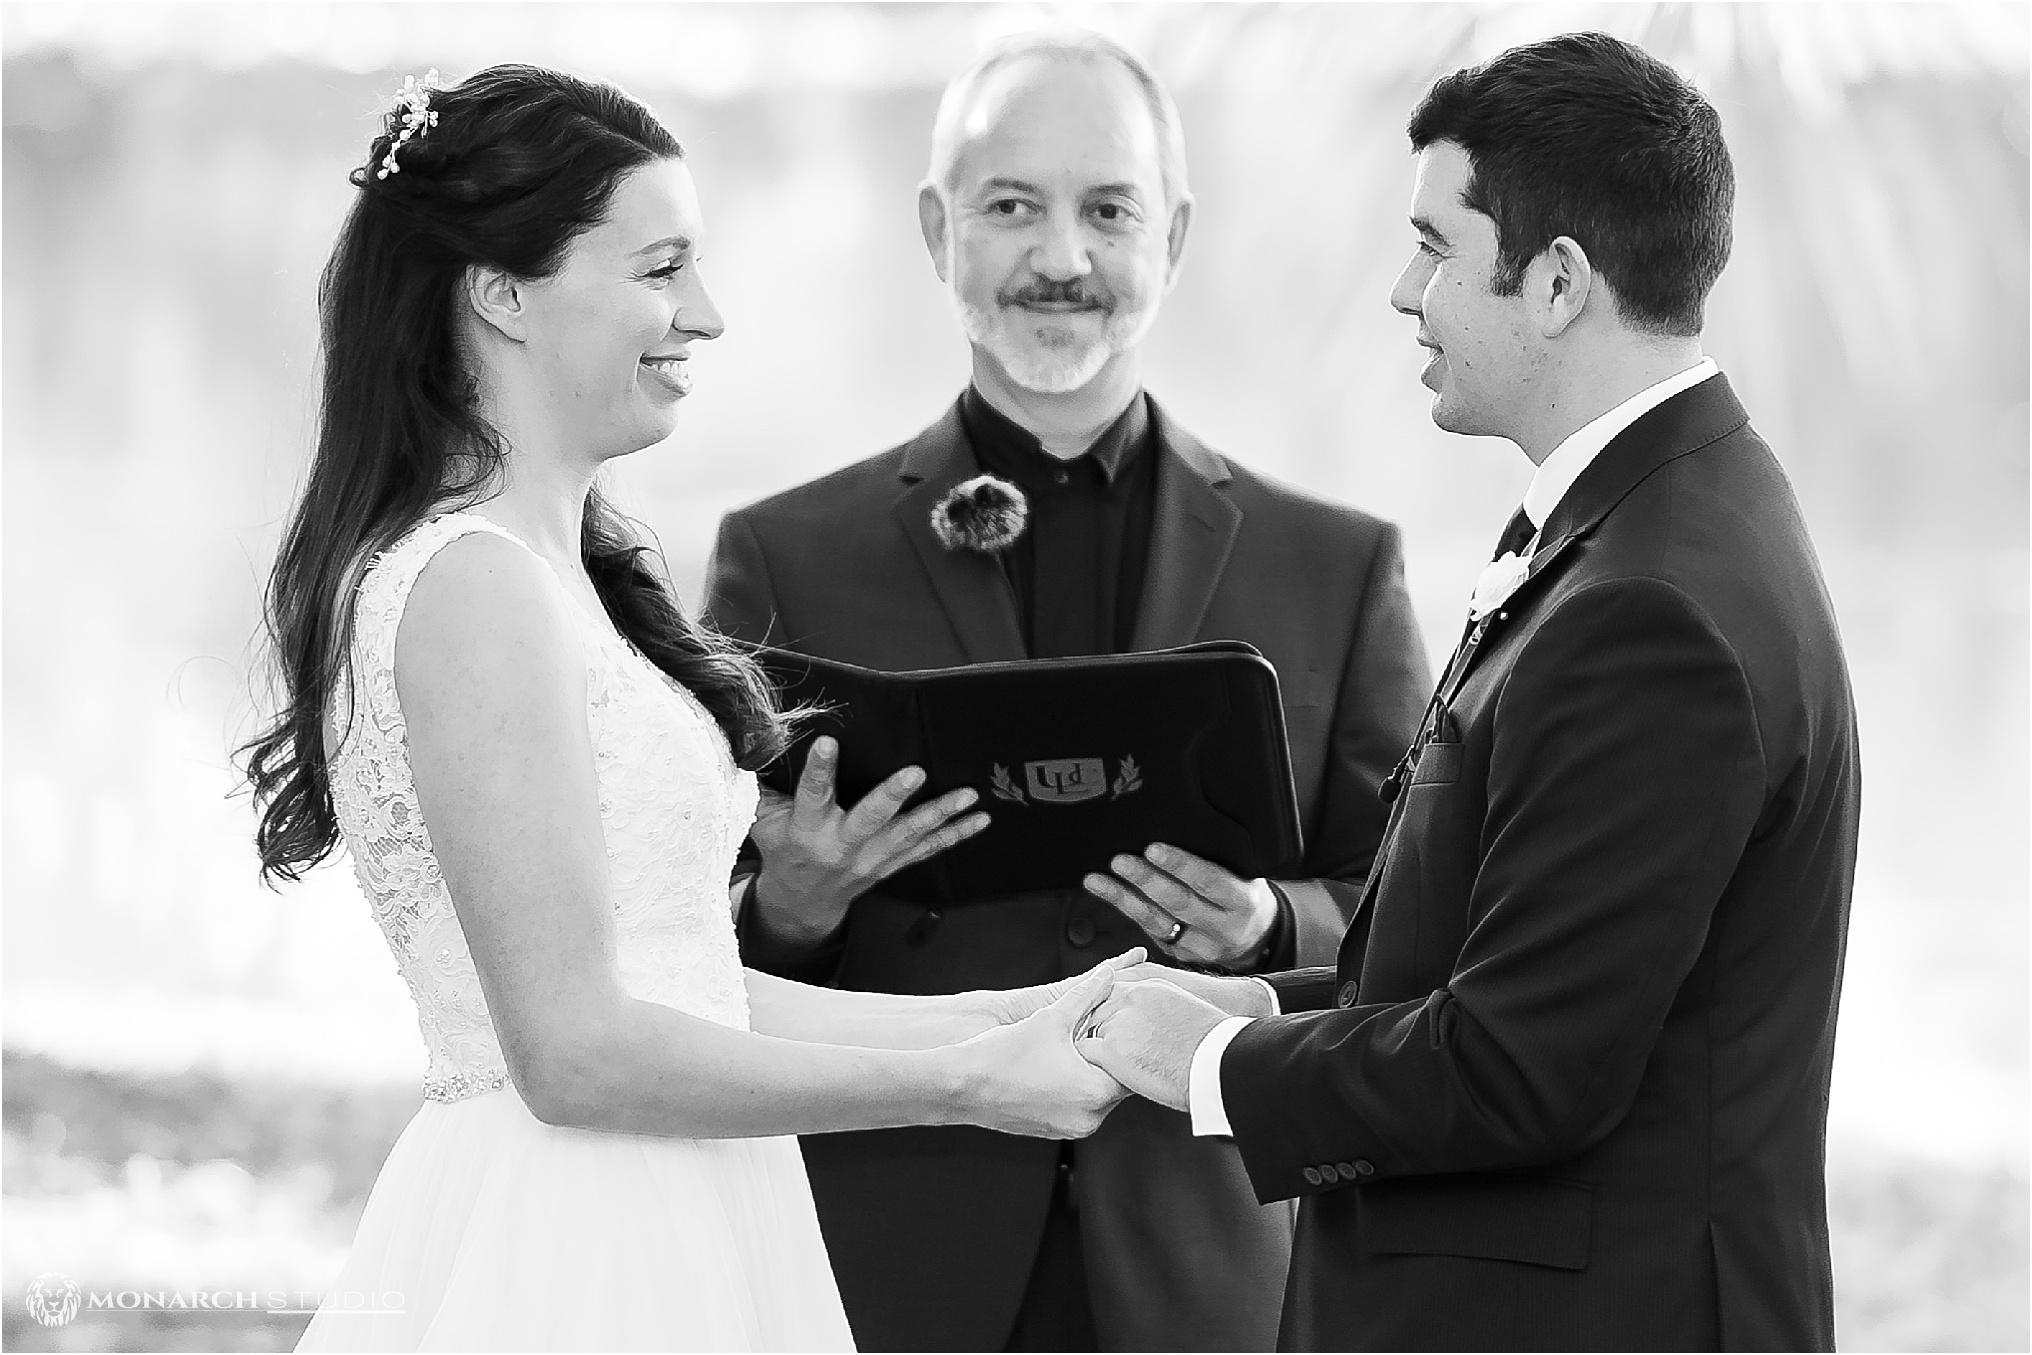 Wedding-photographer-in-sanford-florida-natural-wedding-064.jpg